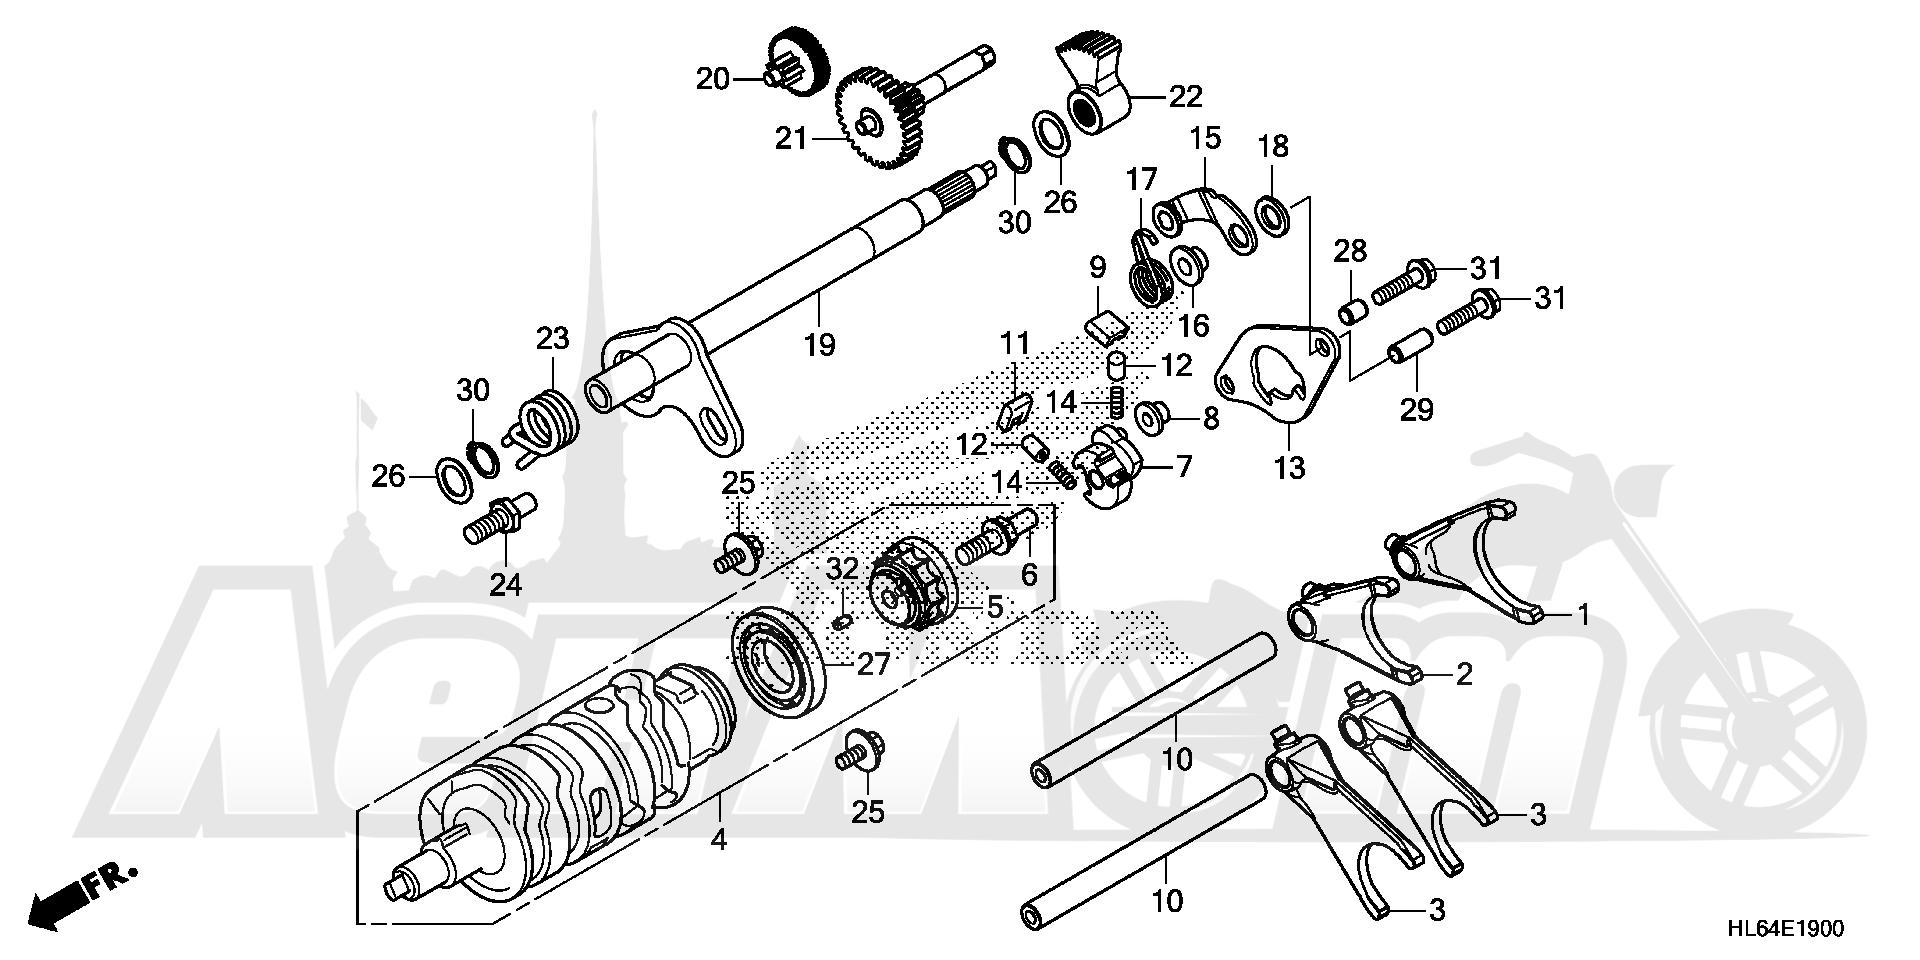 Запчасти для Квадроцикла Honda 2019 SXS1000S2X Раздел: GEARSHIFT FORK | переключение передач вилка